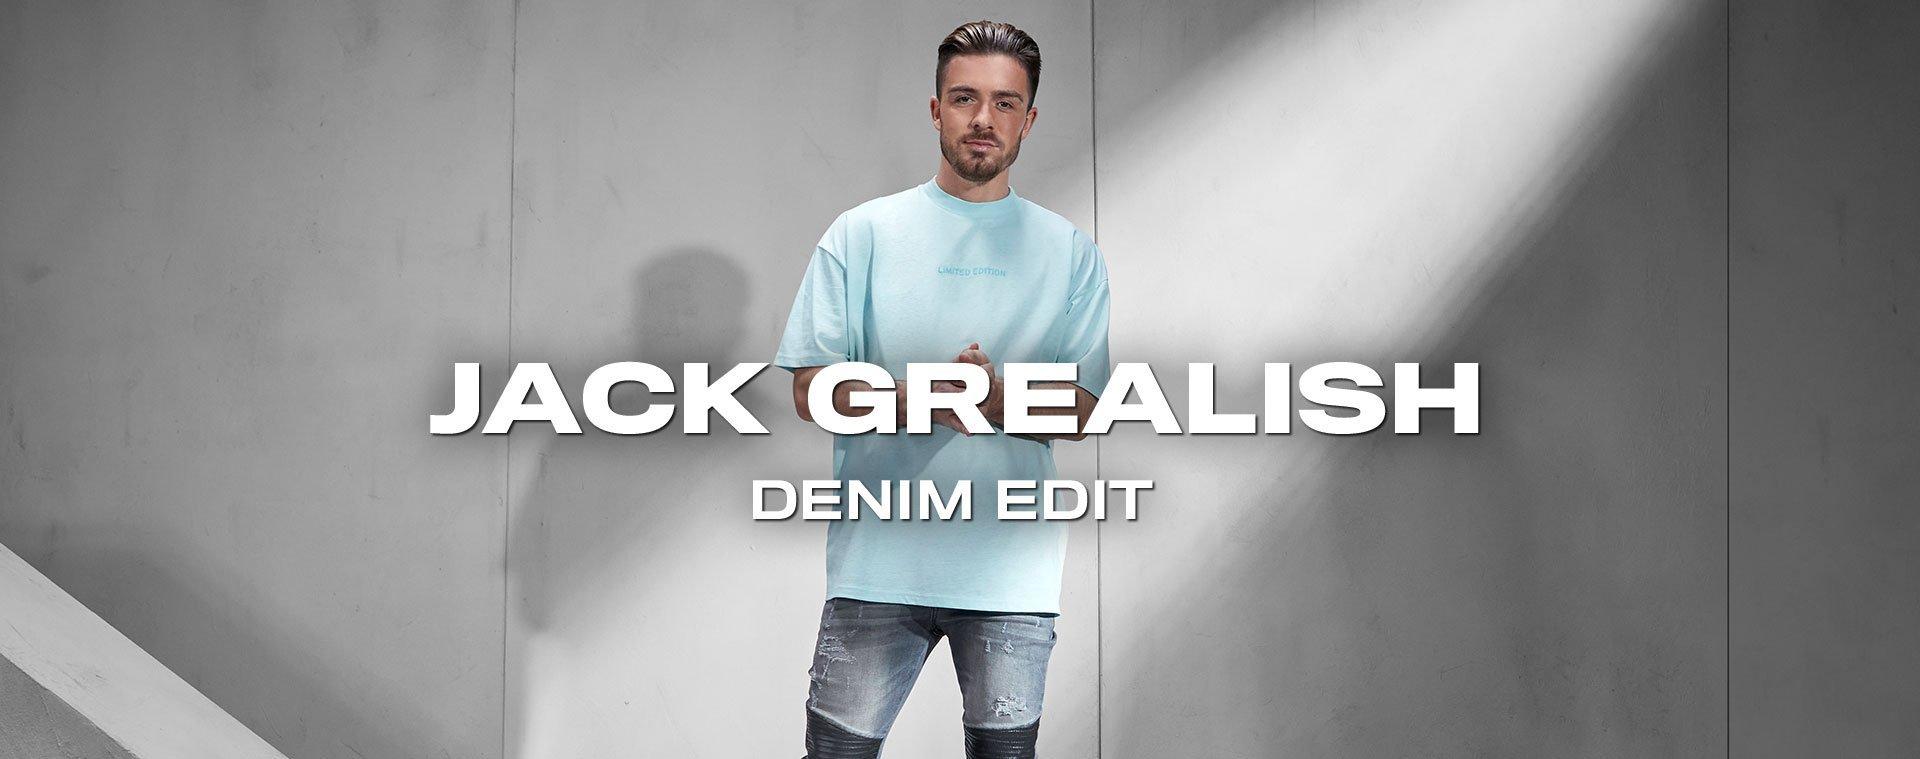 Jack Grealish x Denim Edit Kollektion